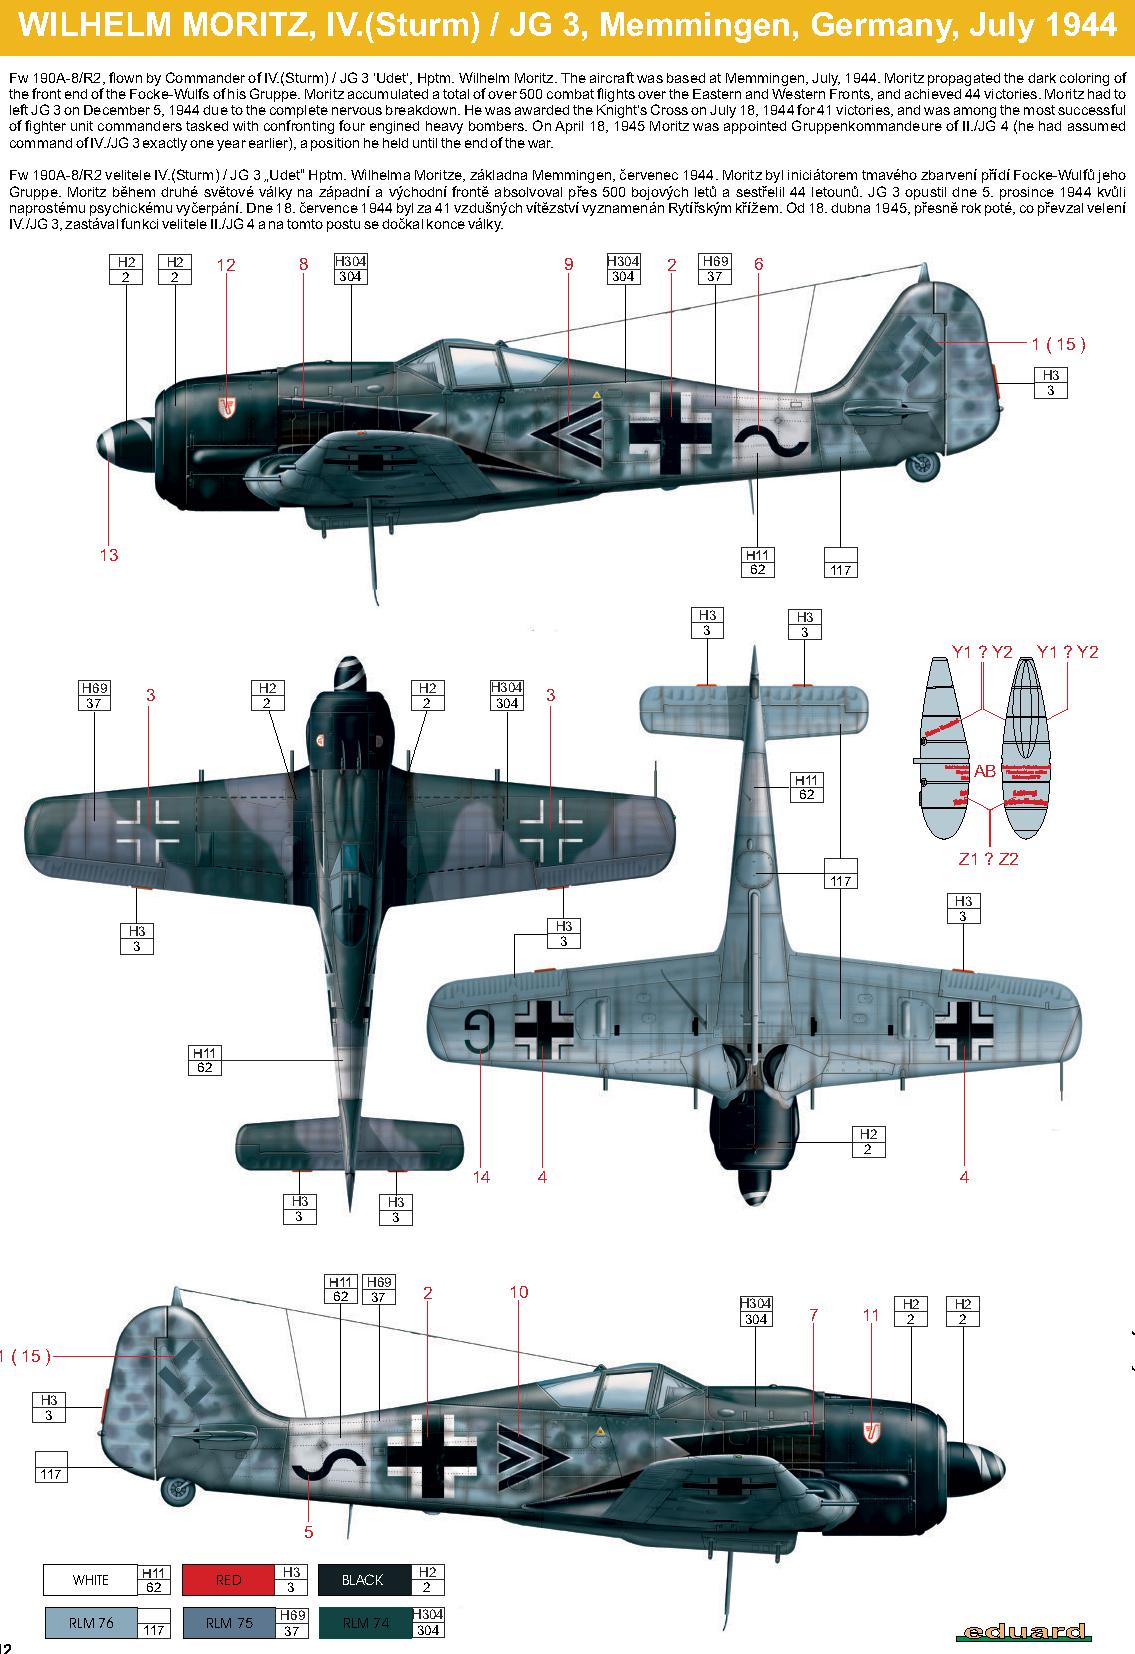 Focke-Wulf-Fw-190A8-Stab-IV.(Strum)JG3-((+~Wilhelm-Moritz-Memmingen-Germany-July-1944-0A.jpg